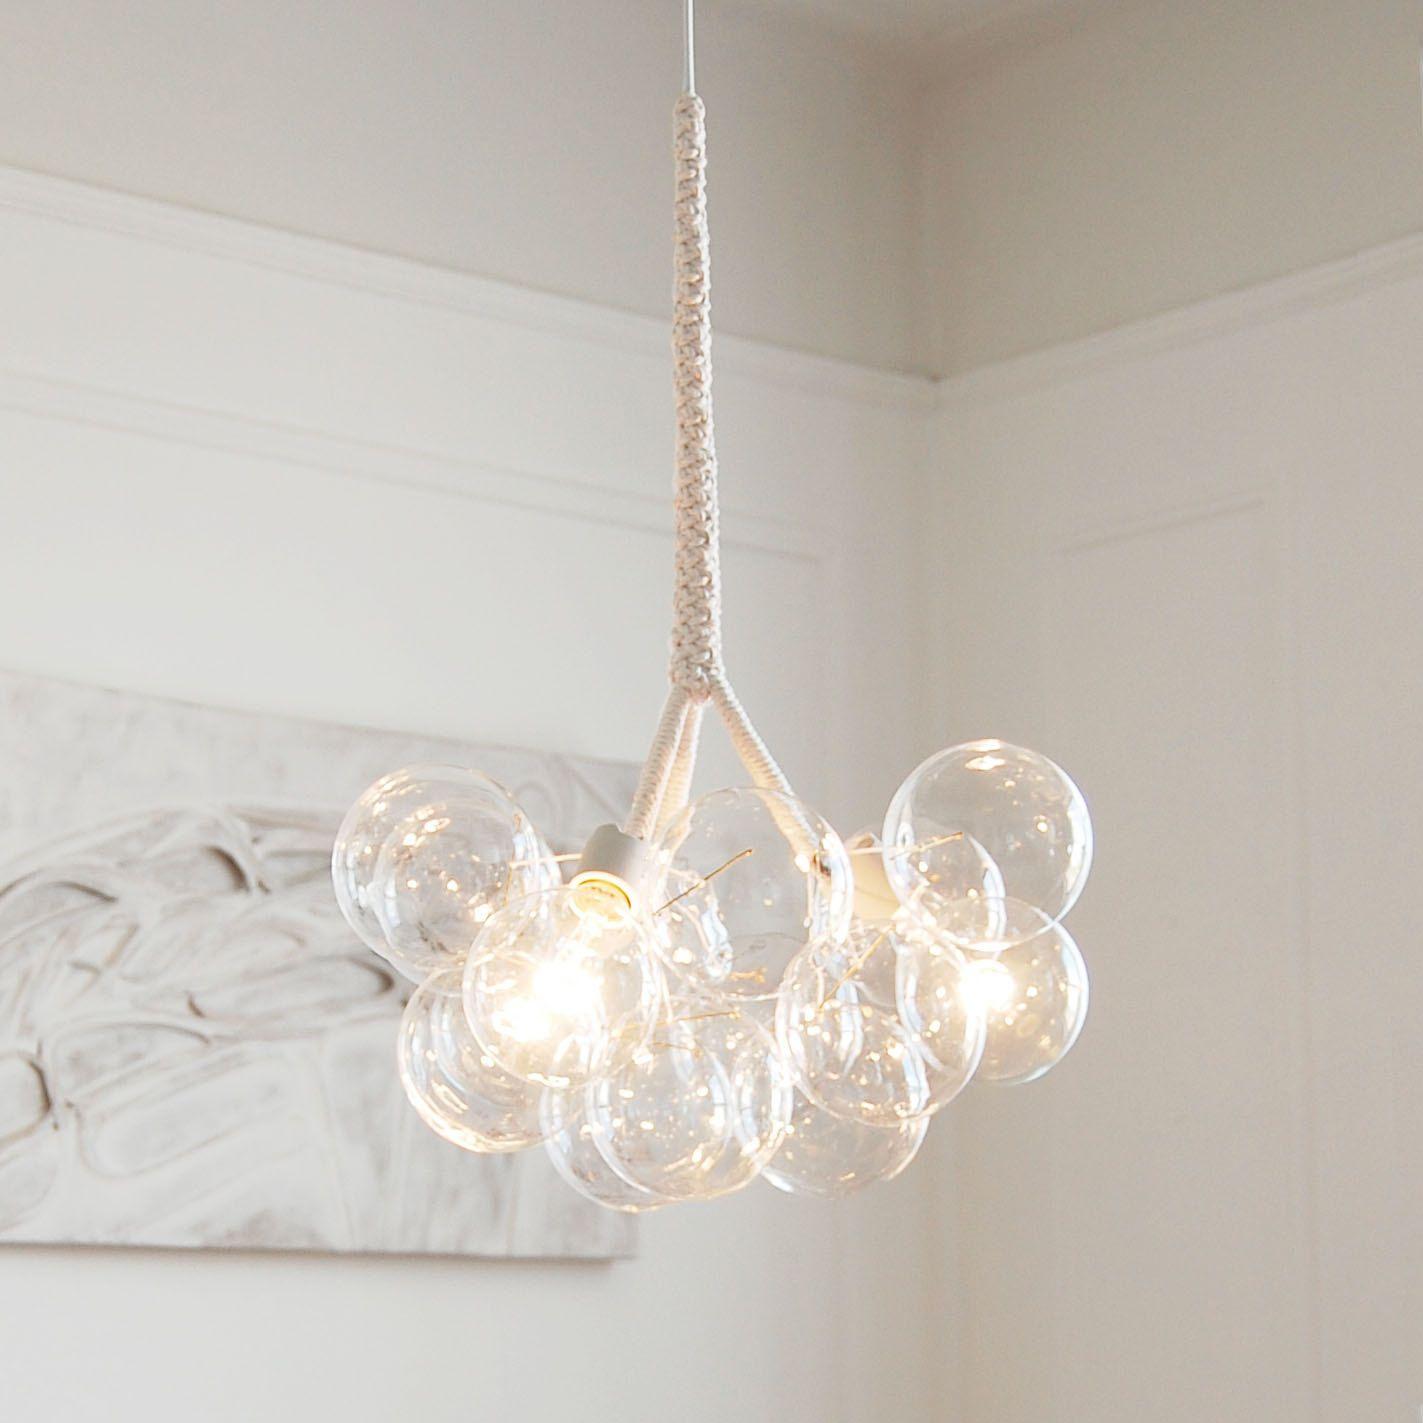 Plafonnier Salle De Bain Jumbo ~ chandelier light fixtures pinterest luminaires lampes et lys